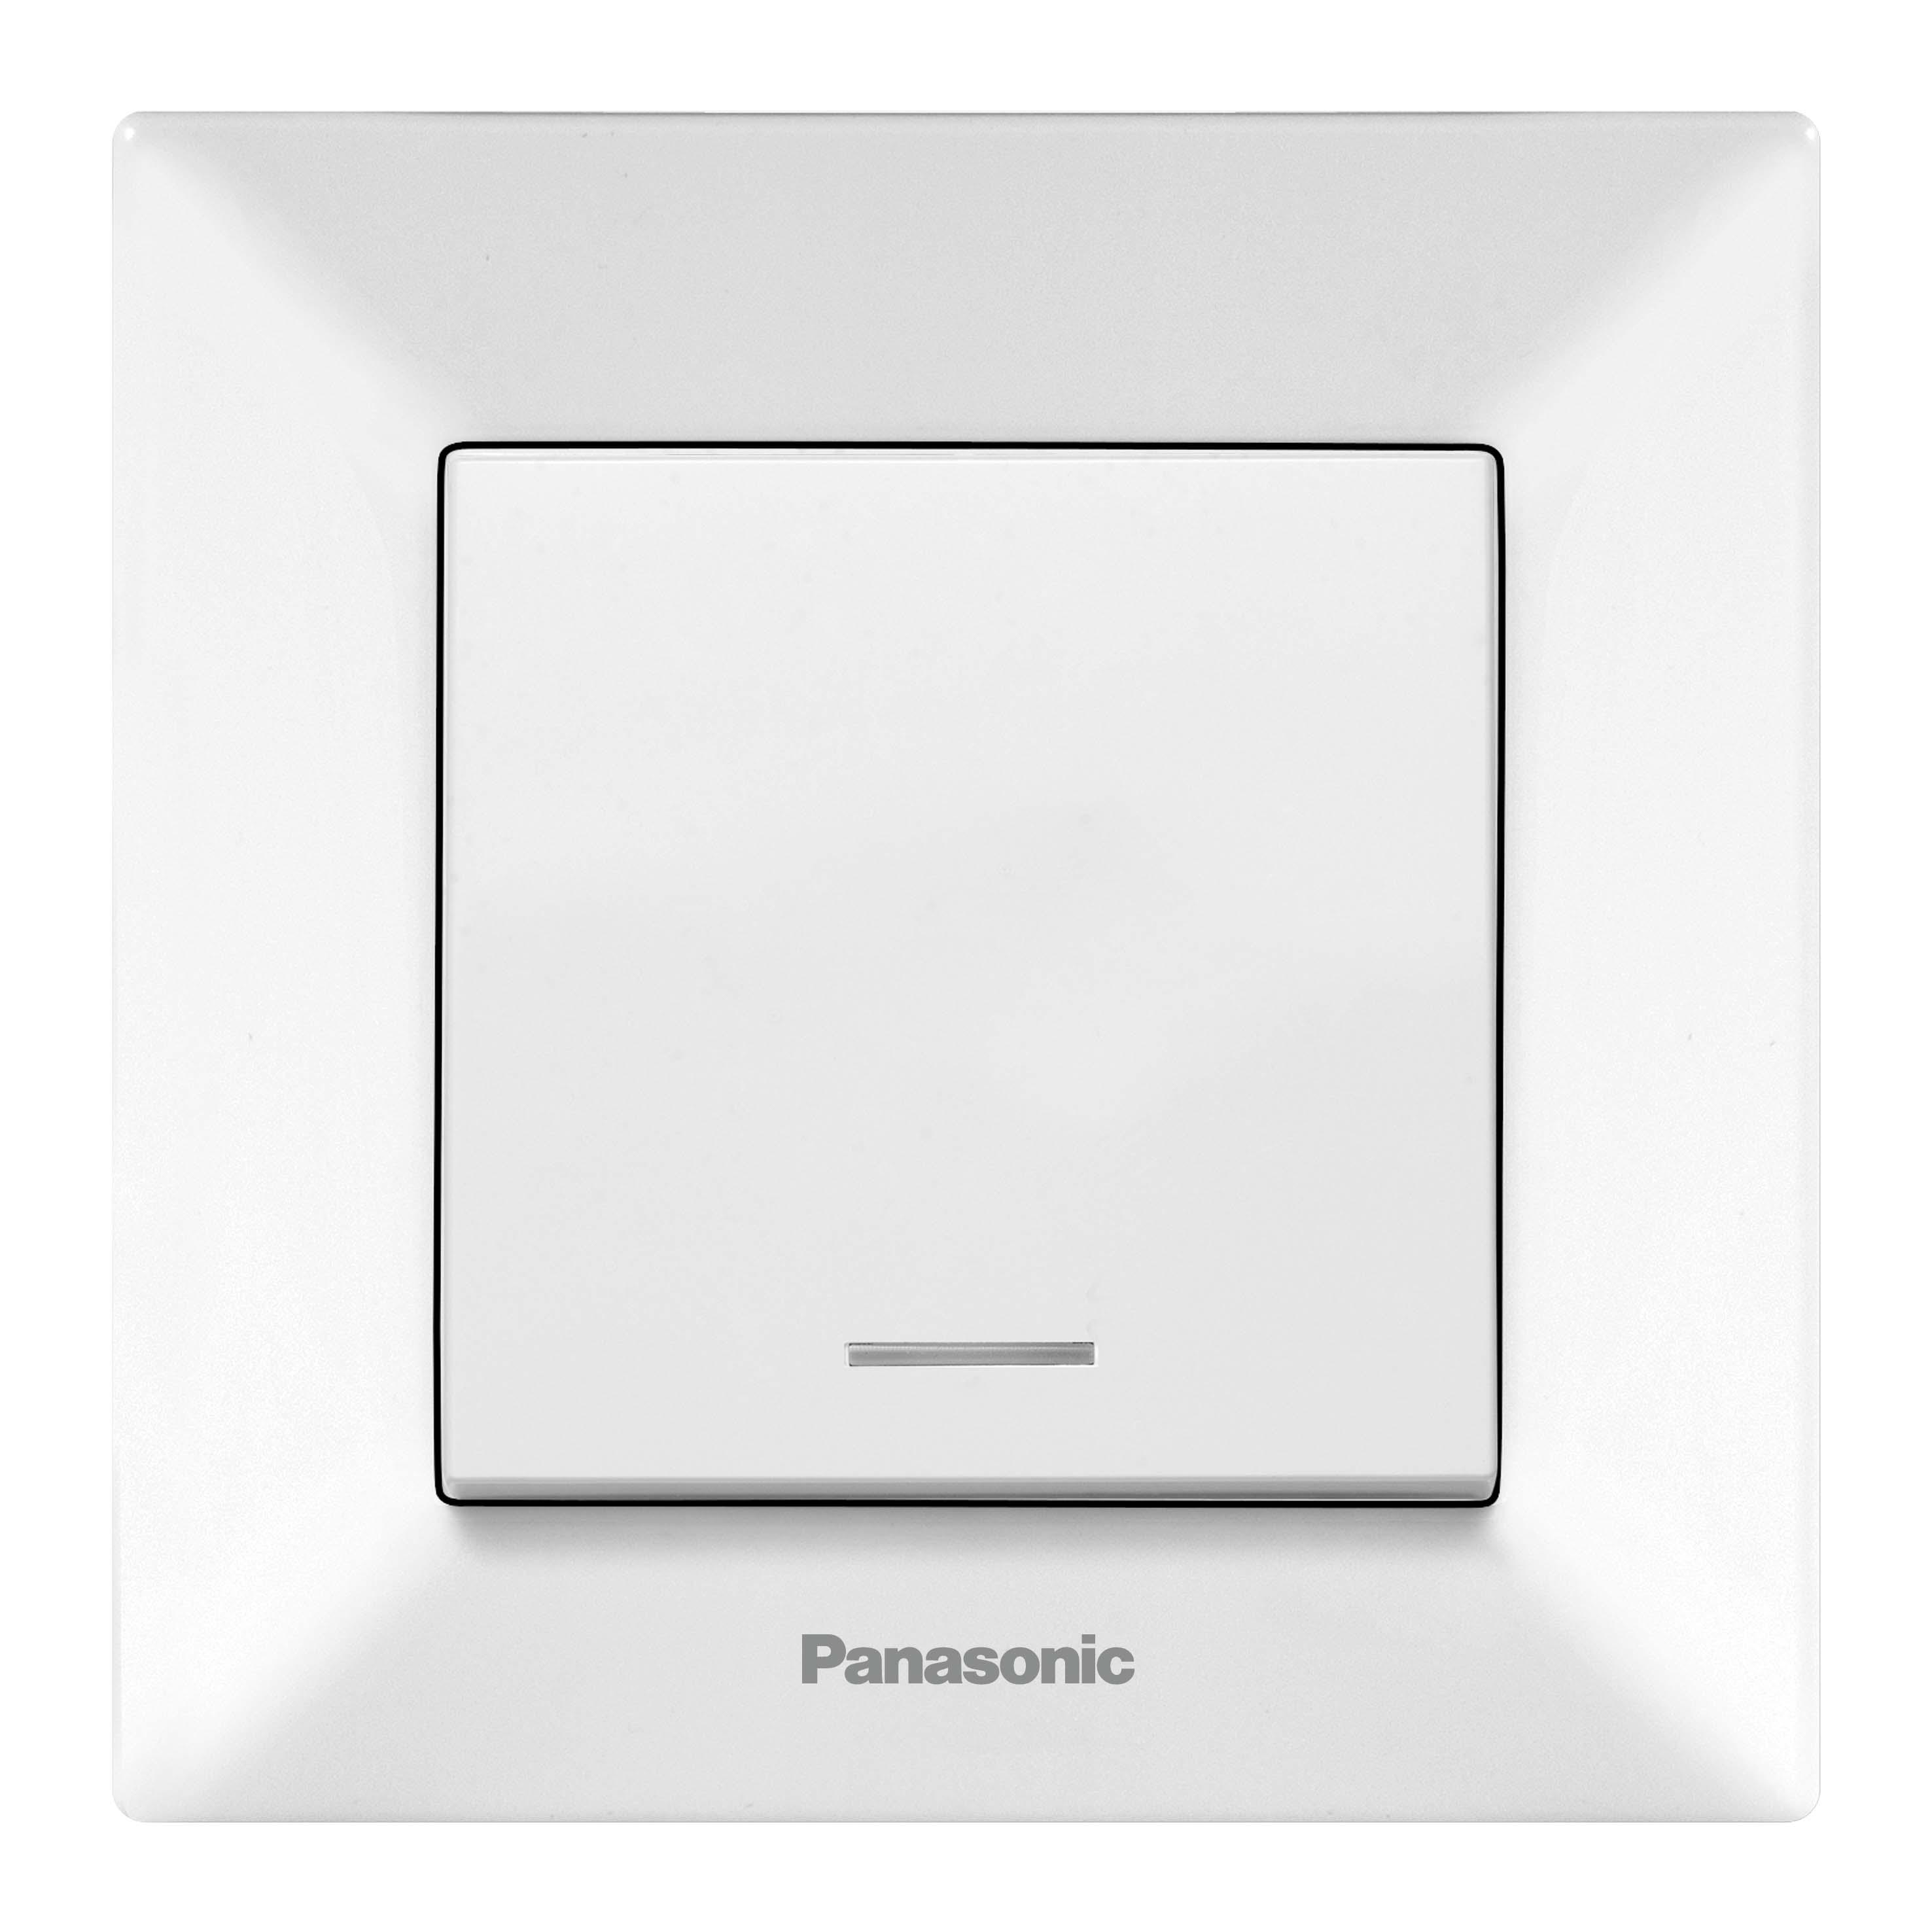 Выключатель Panasonic Wmtc0002-2wh-res arkedia розетка panasonic wktf0809 2wh res arkedia